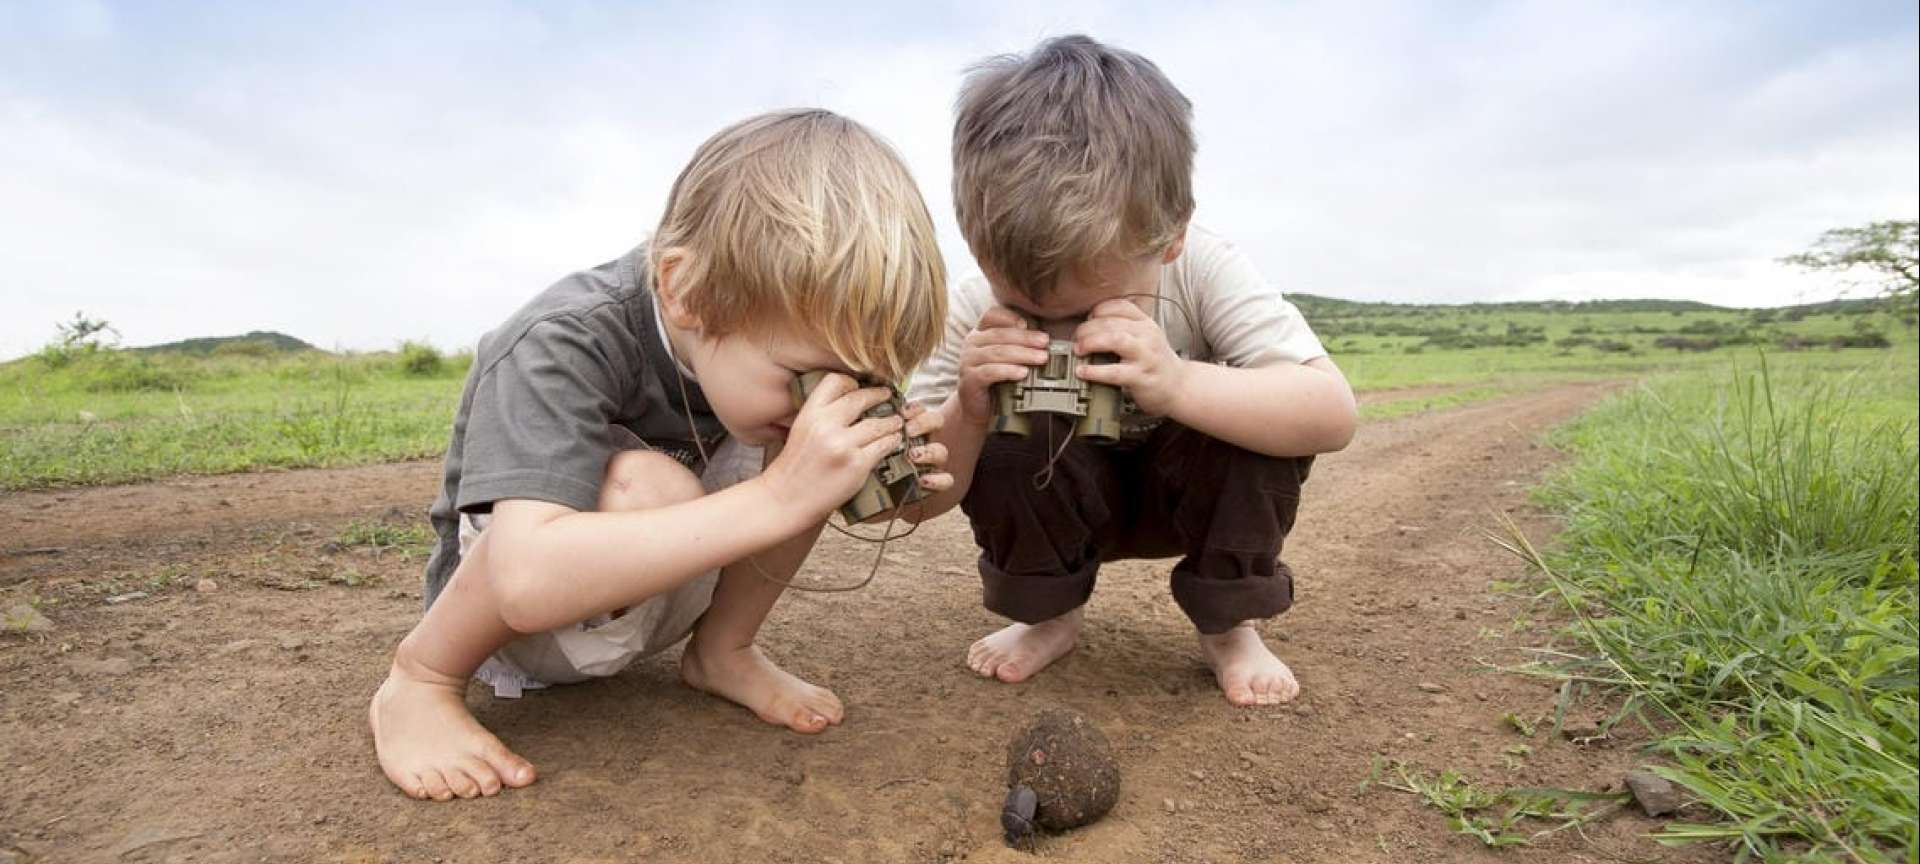 Family & kid-friendly safaris in Africa - Africa Wildlife Safaris